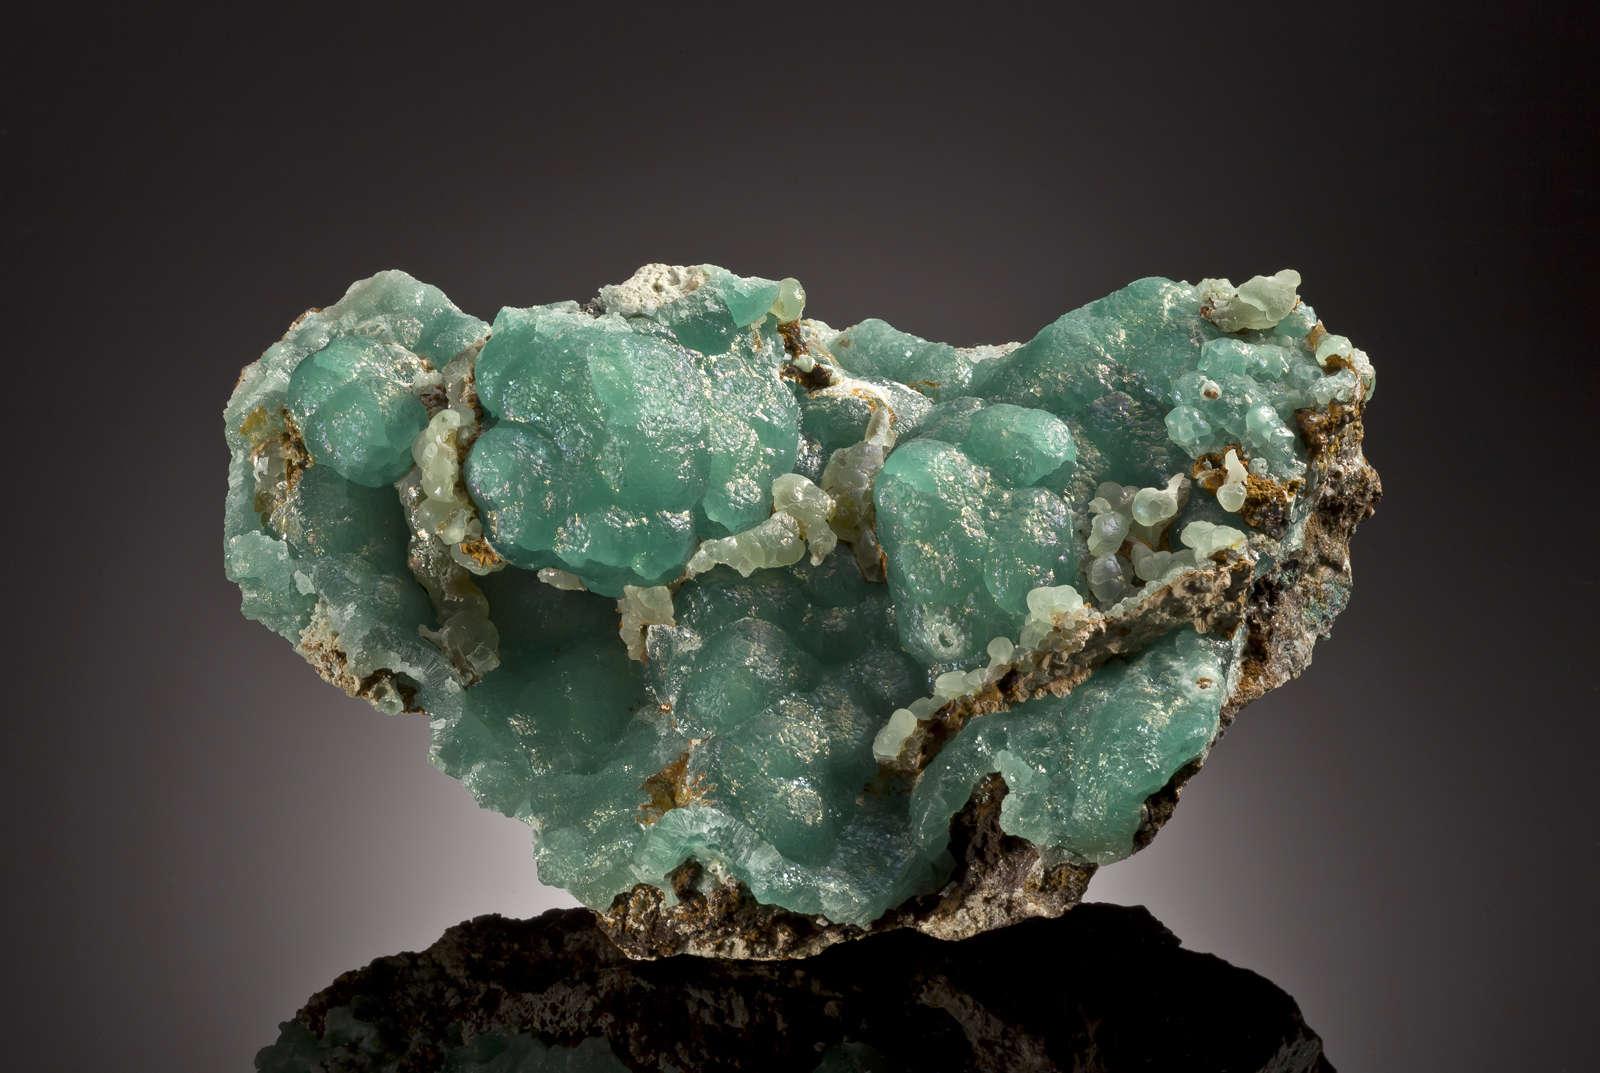 An unusually intense aqua sea blue color makes large smithsonite plate